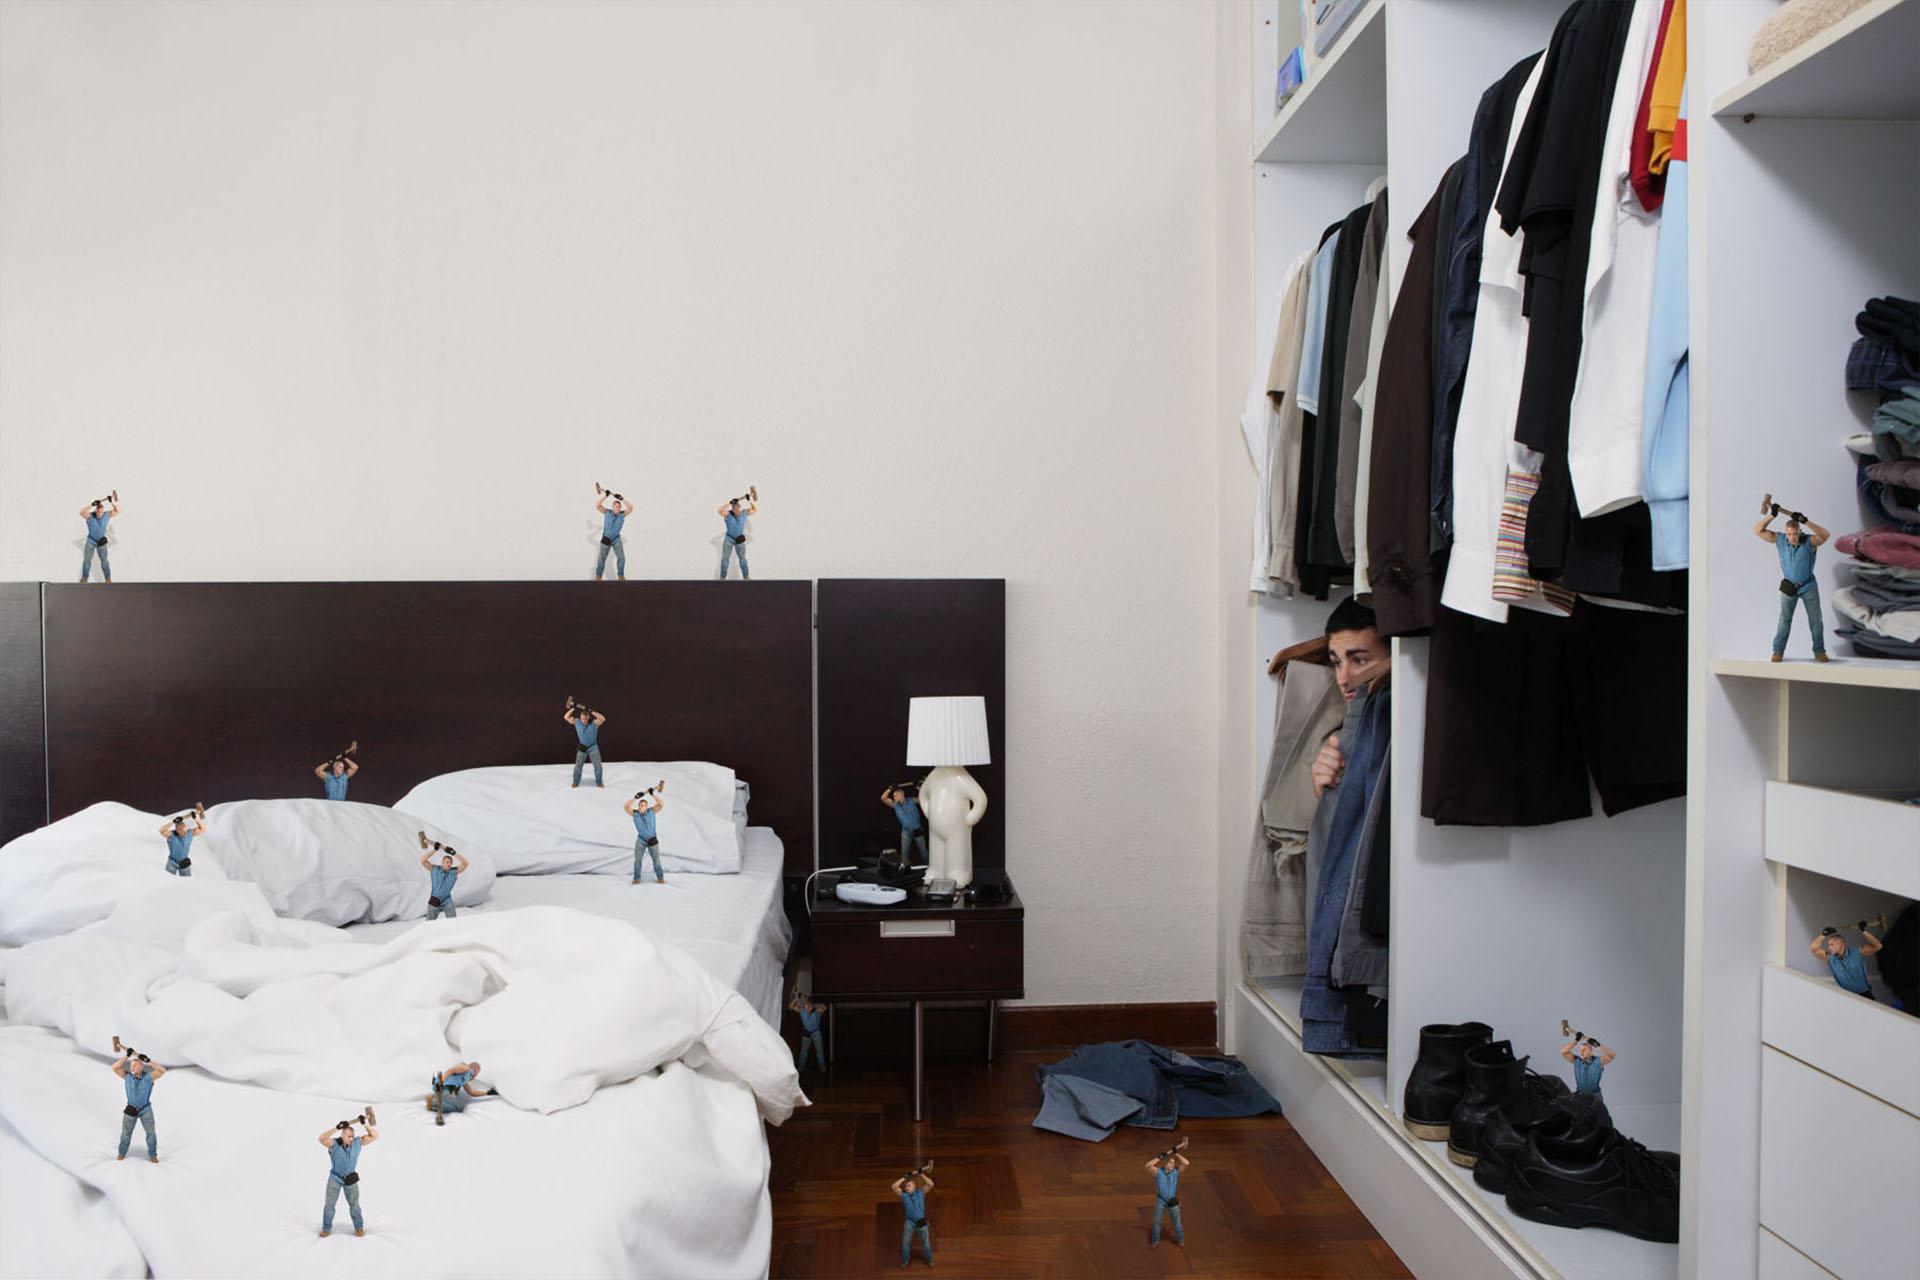 011 Alka Seltzer-bedroom 8552 f